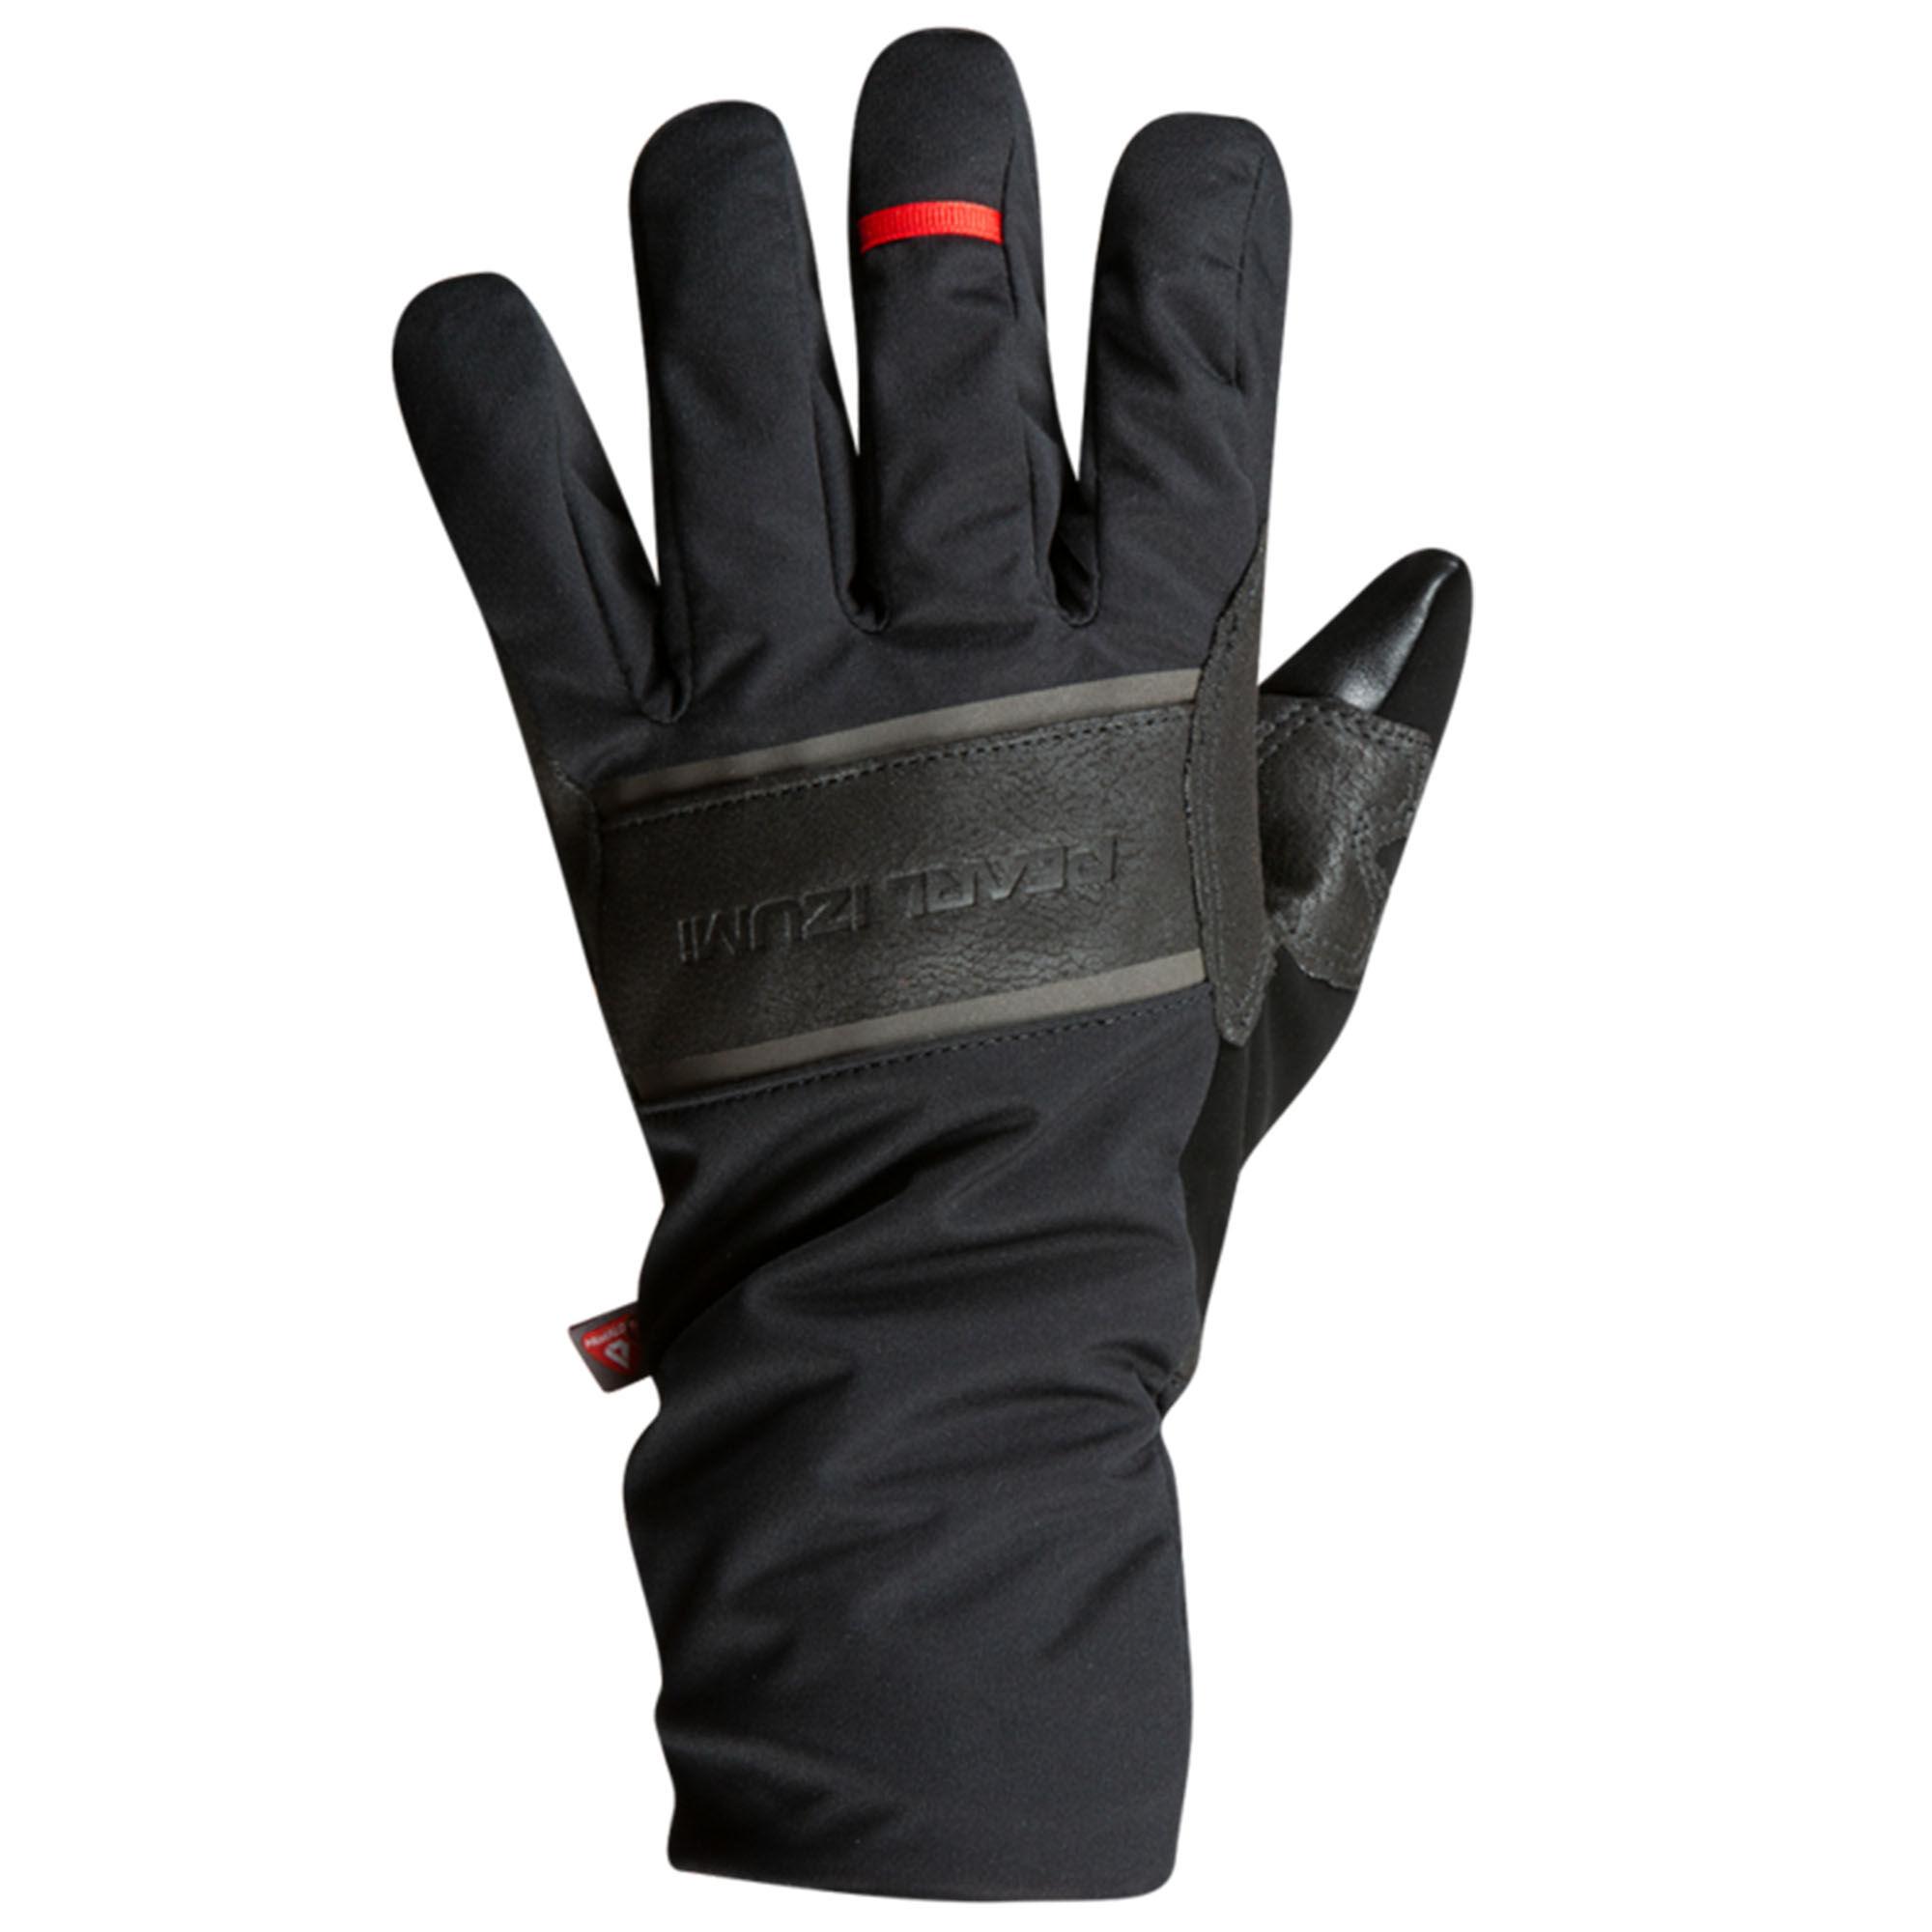 Pearl Izumi Men's Amfib Gel Bike Gloves  - Black - Size: Large